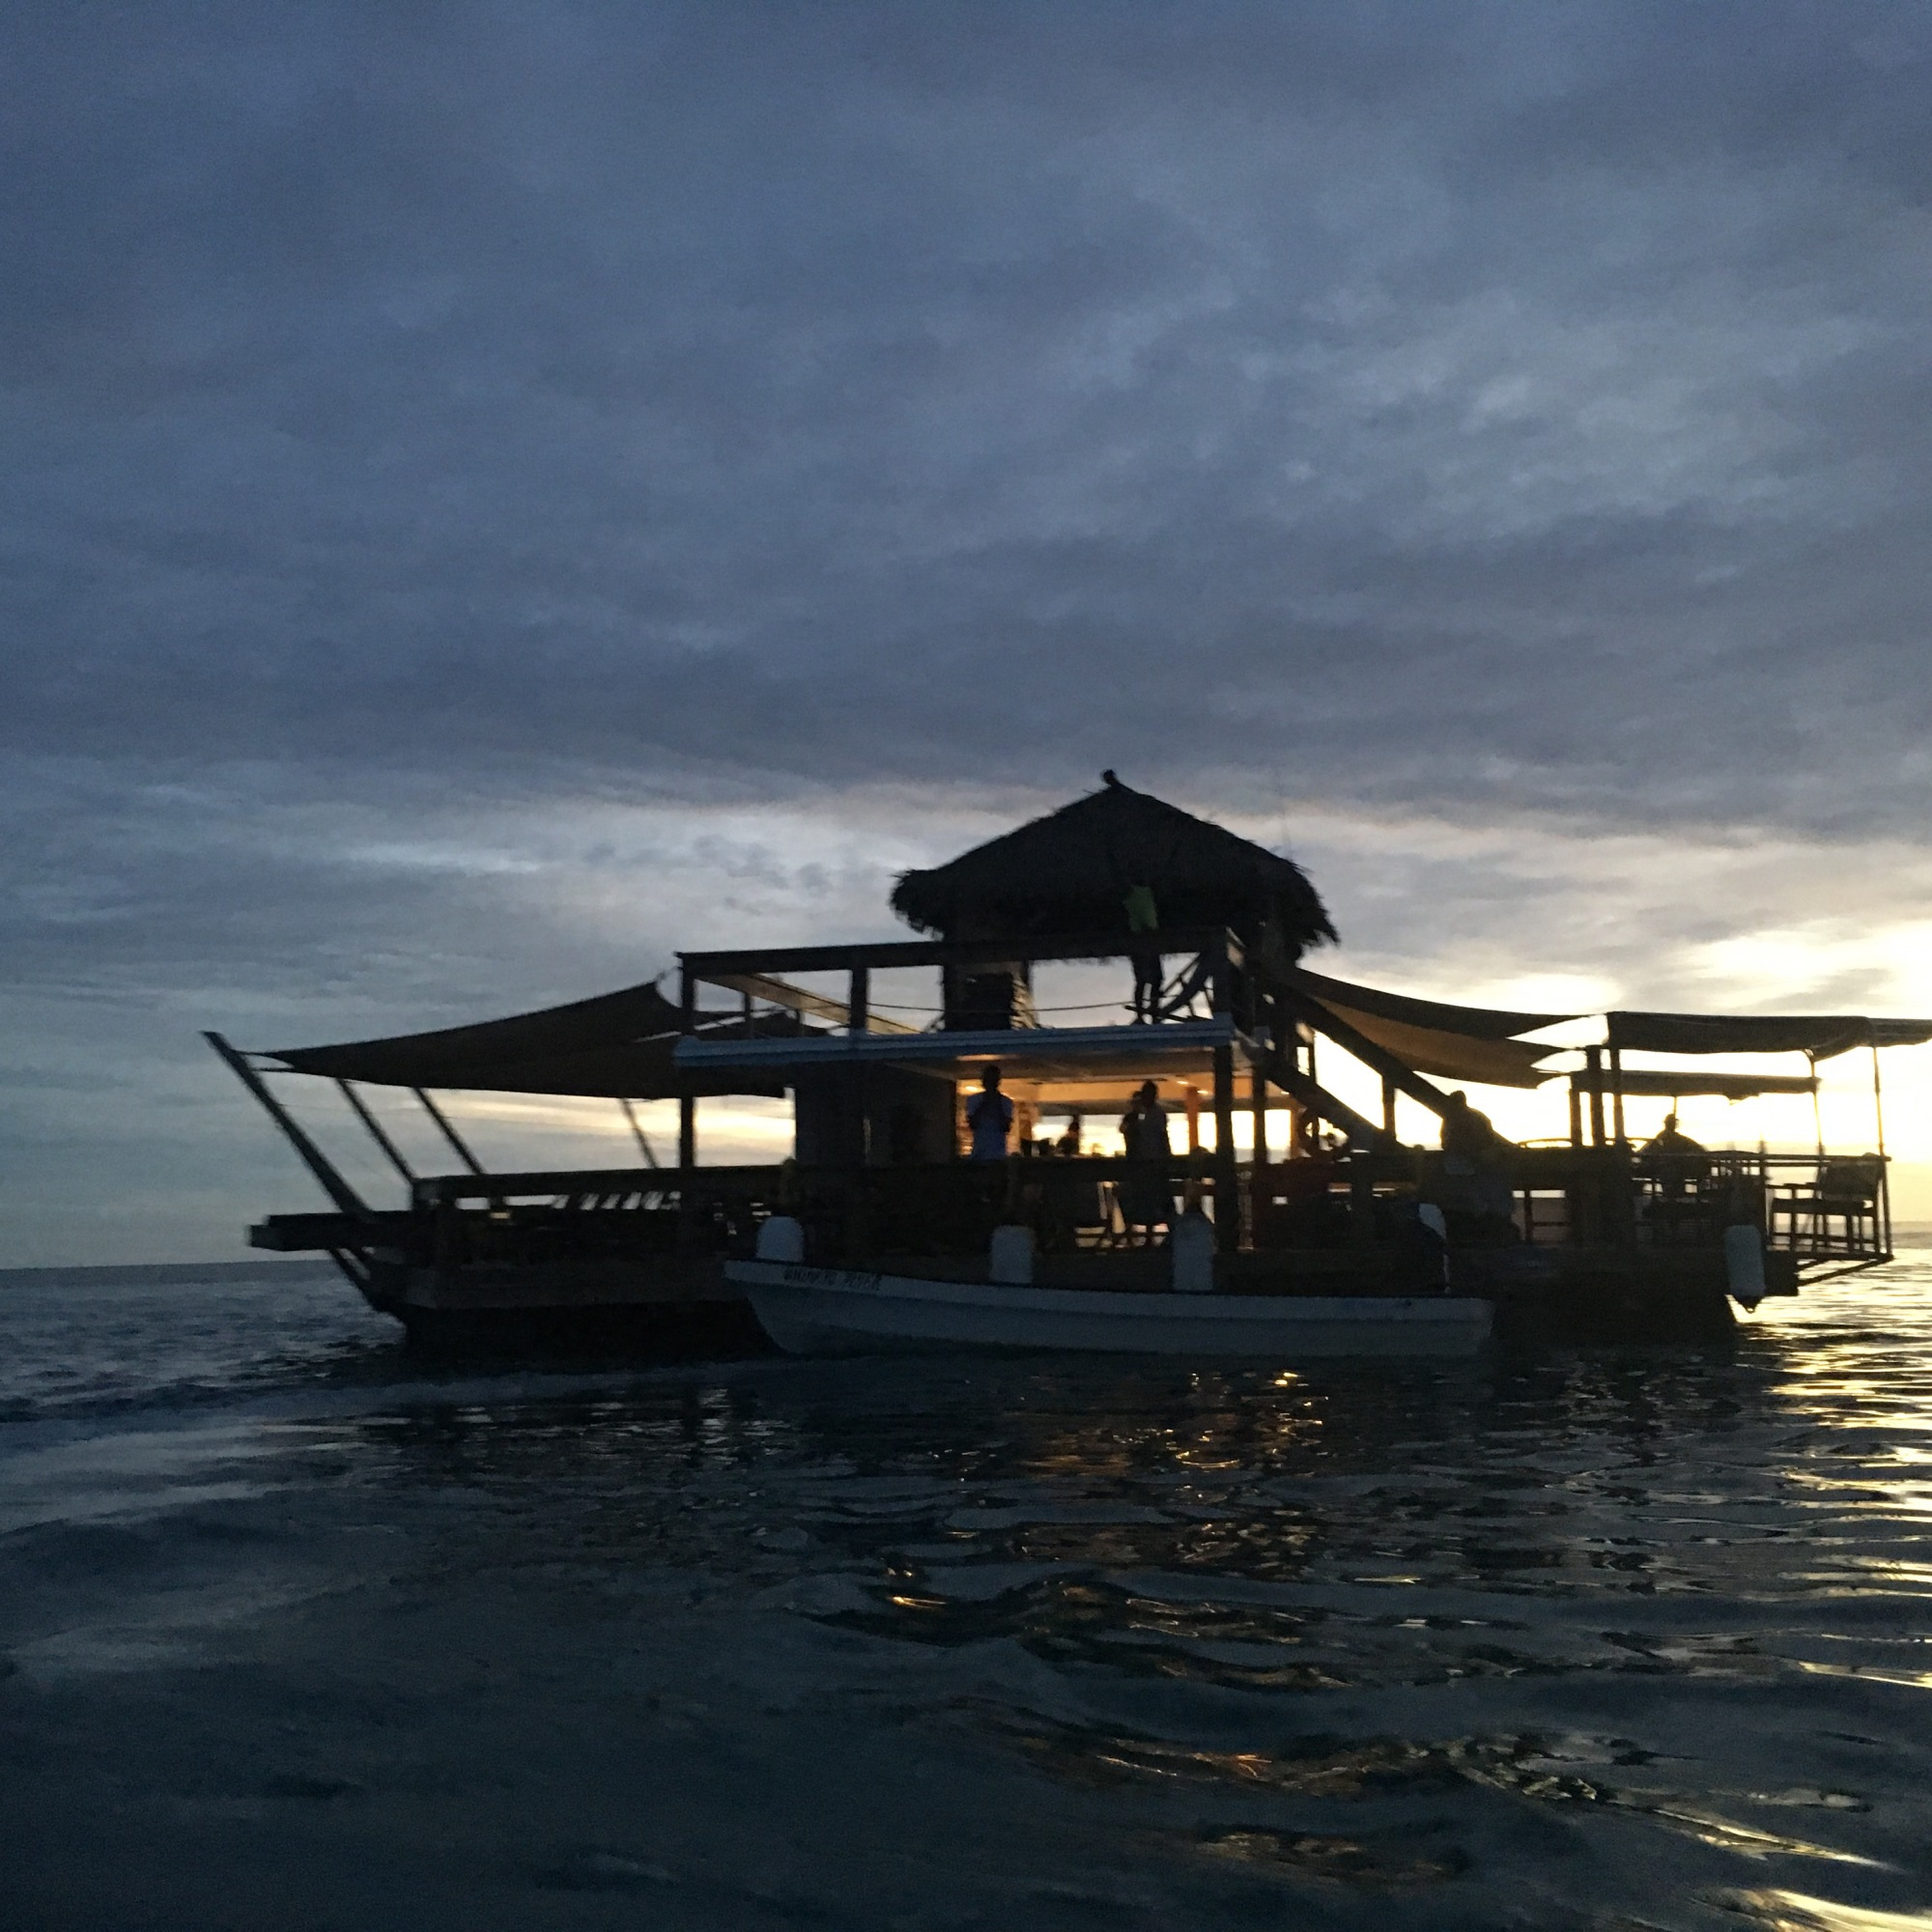 Cloud9-schwimmende Bar